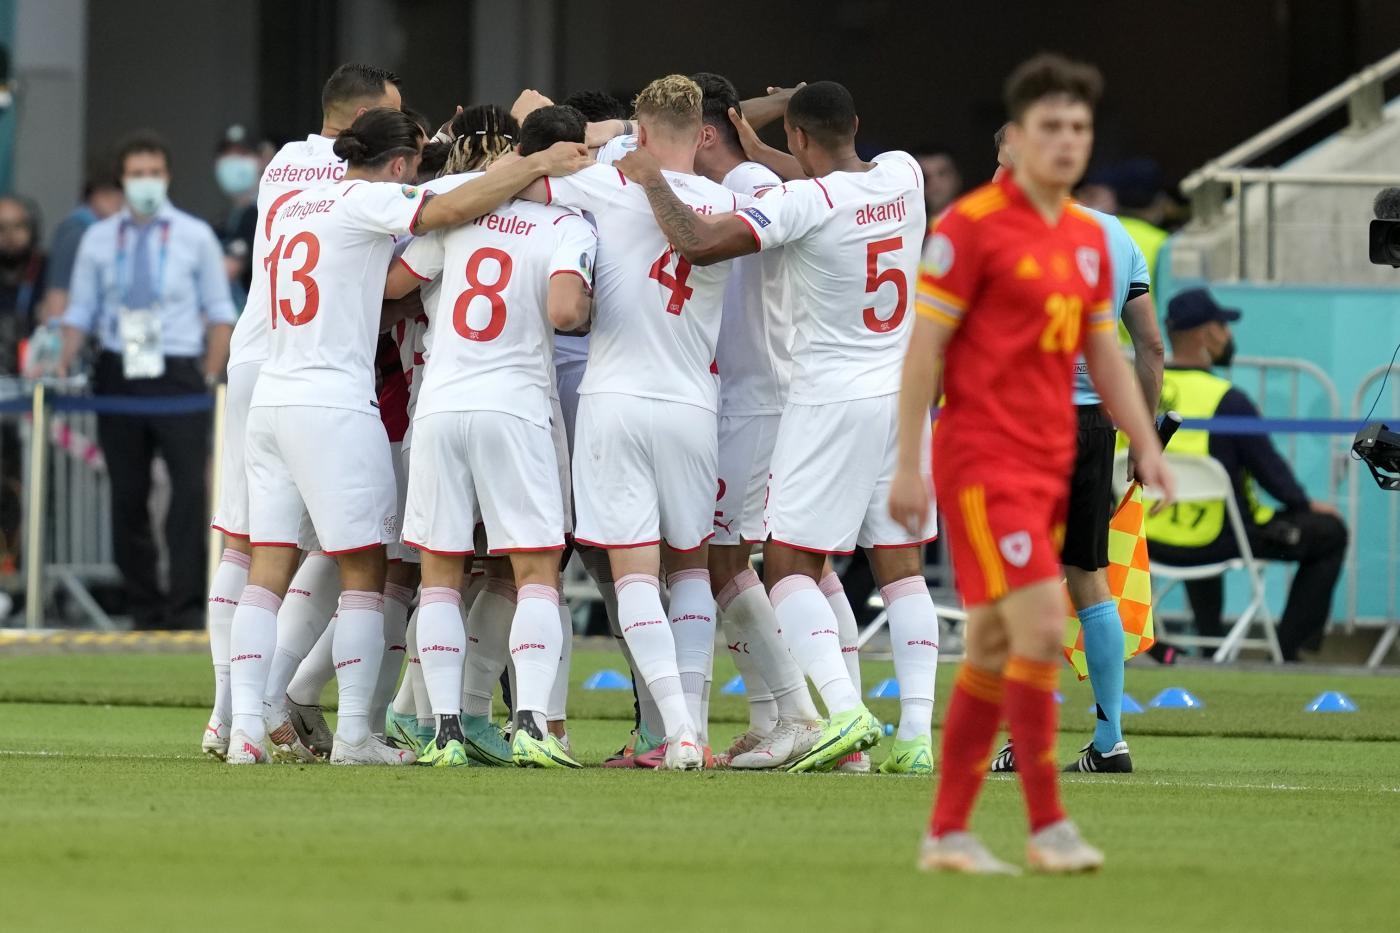 Euro2020: termina in pareggio Galles-Svizzera. L'Italia sorride, prima in solitaria